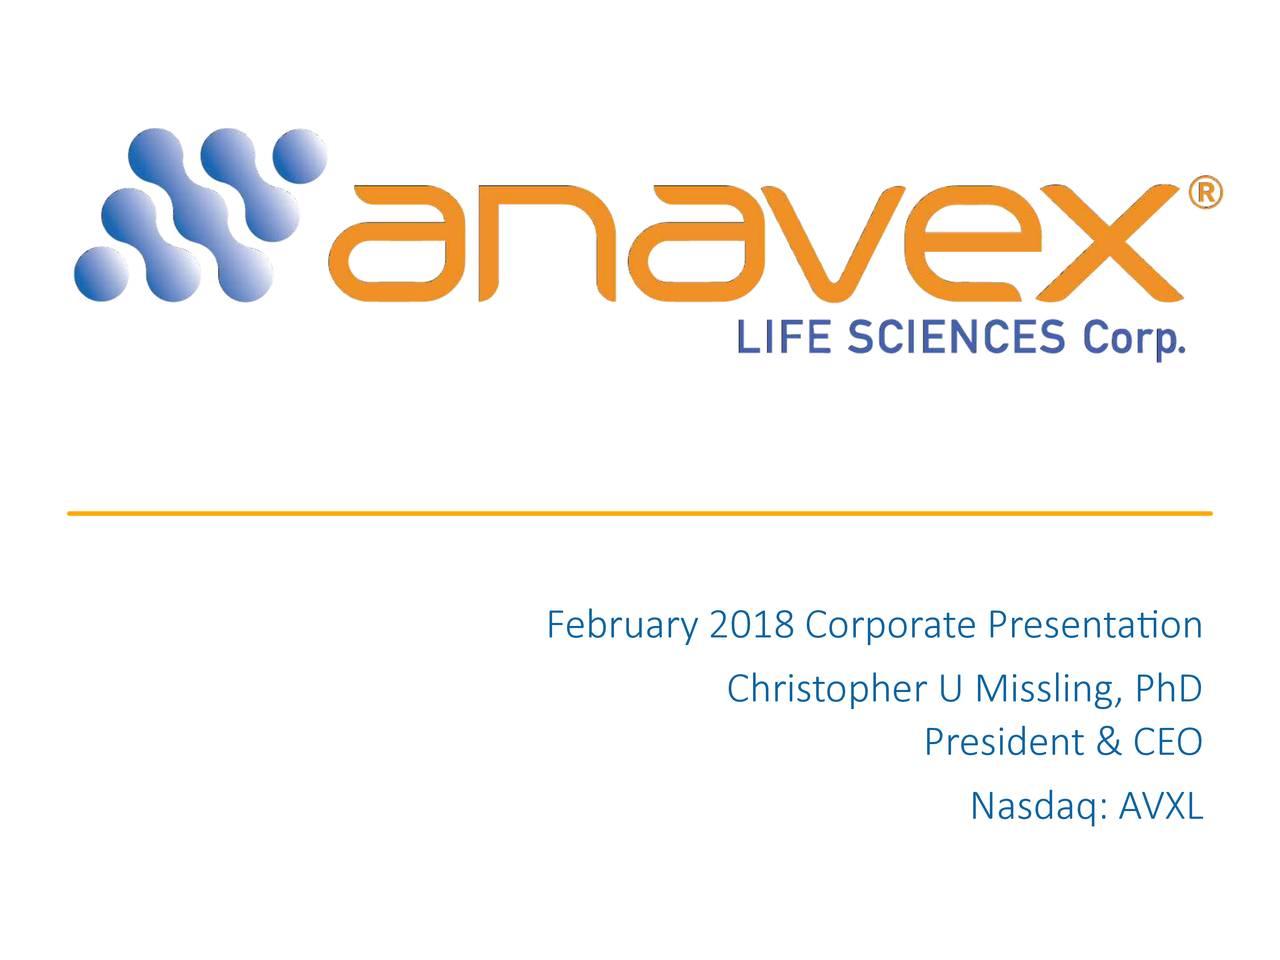 Christopher U Missling, PhD President & CEO Nasdaq: AVXL